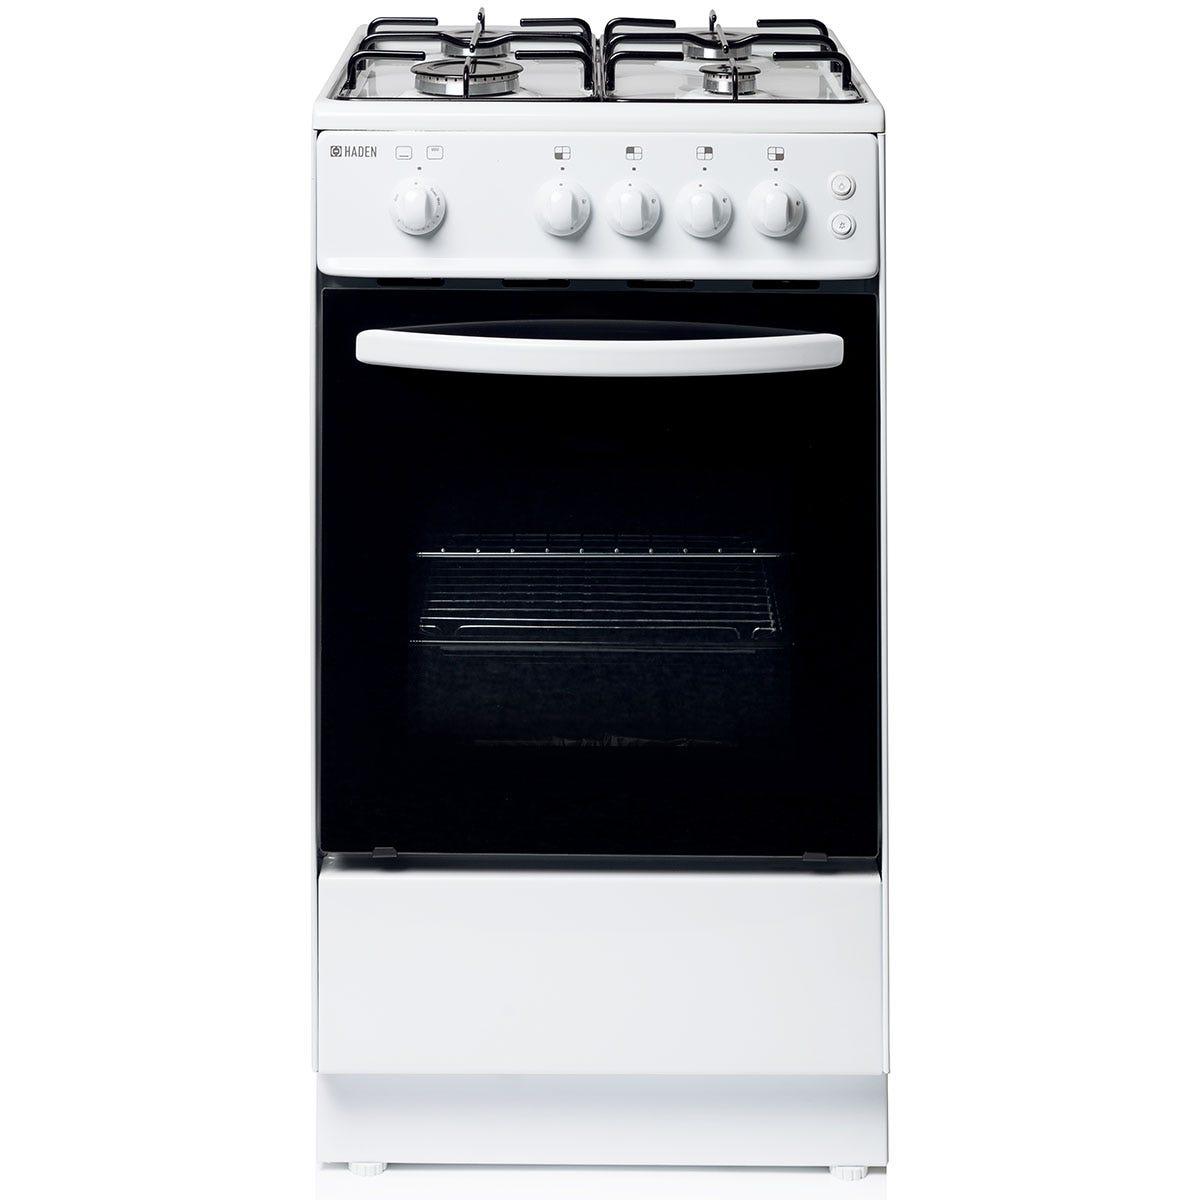 Haden HGS50W 50cm Freestanding Single Cavity Gas Cooker - White